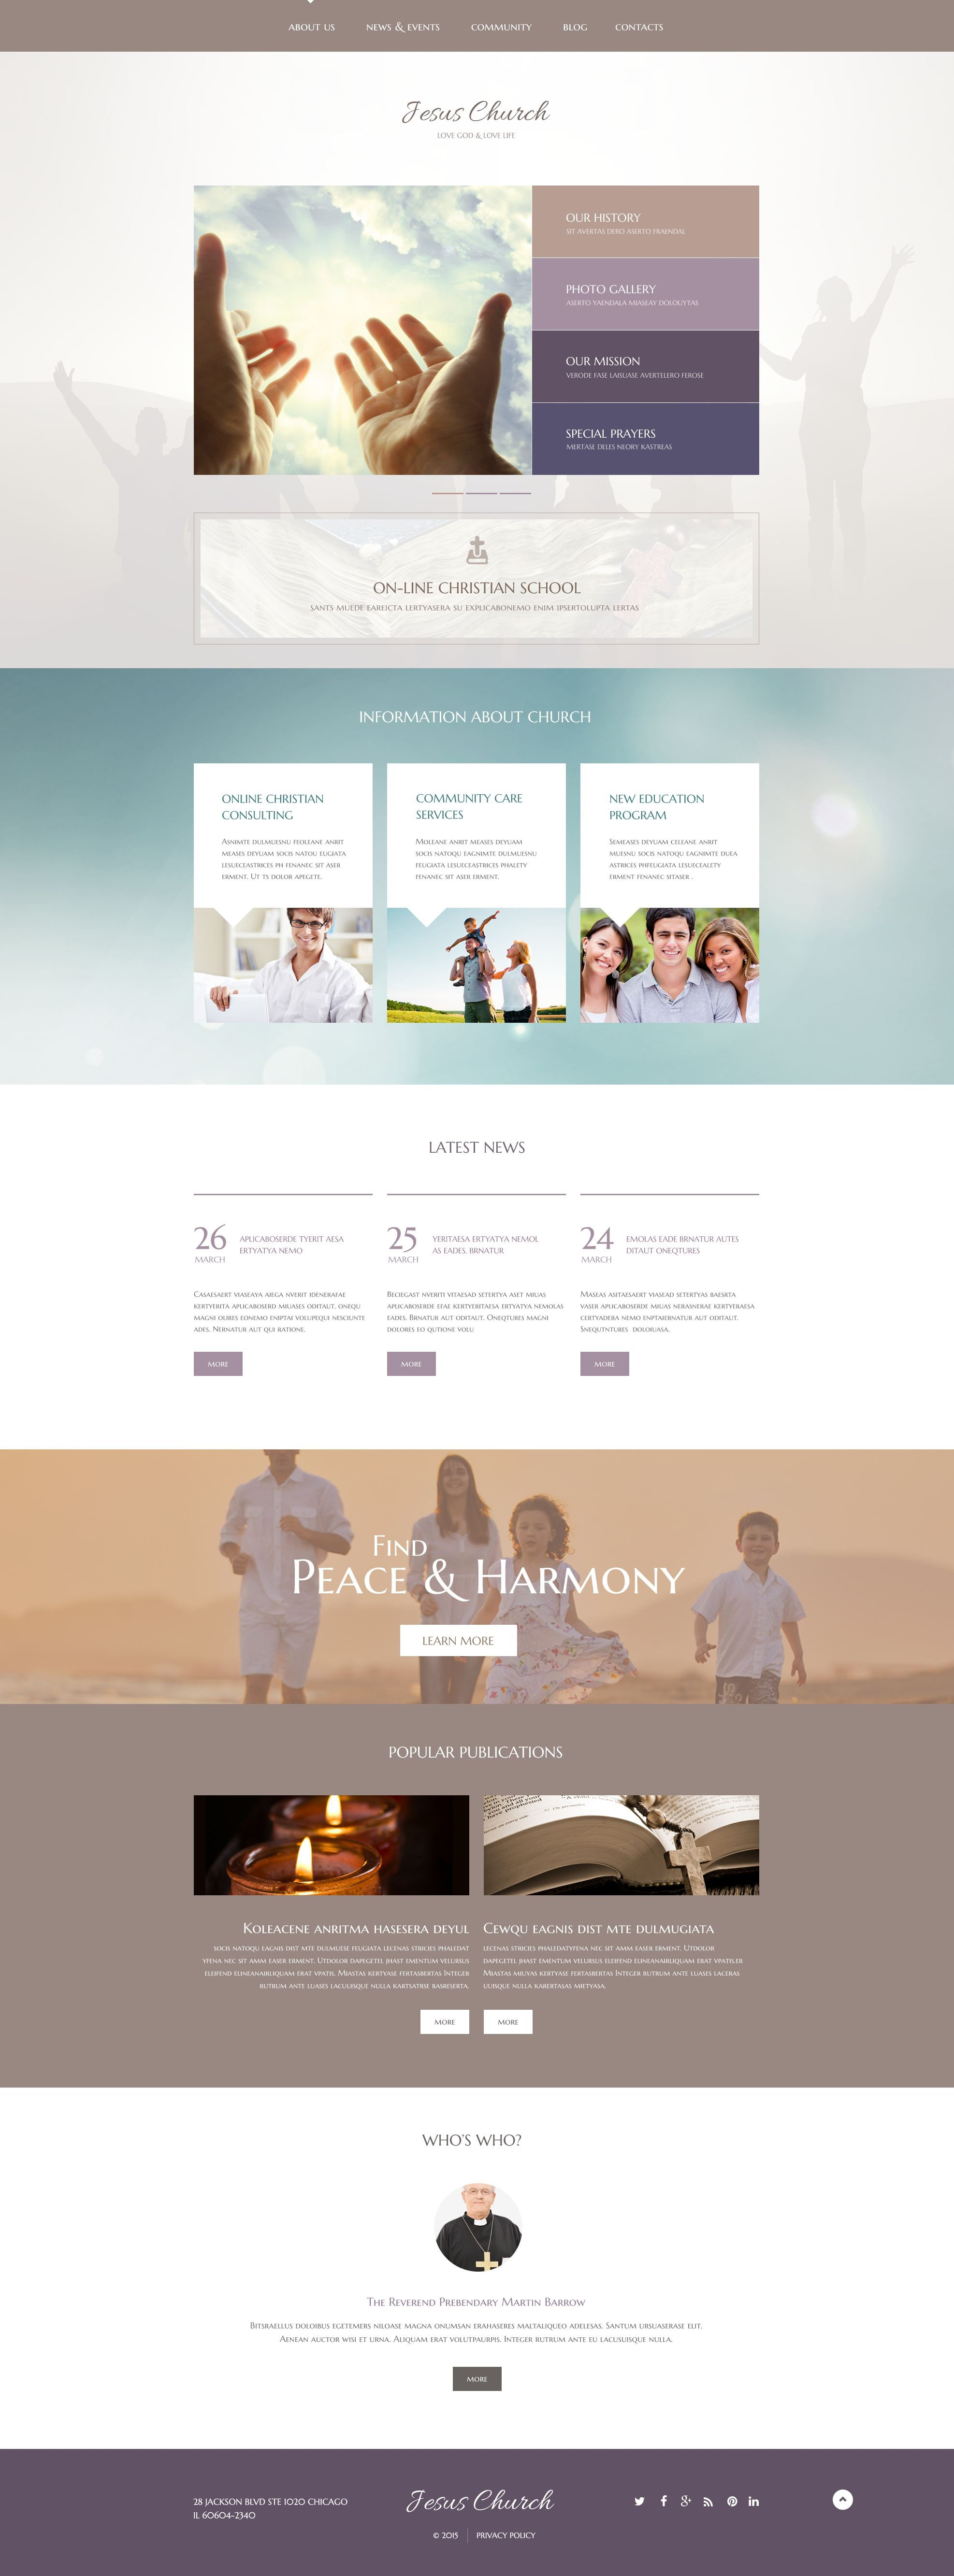 Responsivt Jesus Church WordPress-tema #54859